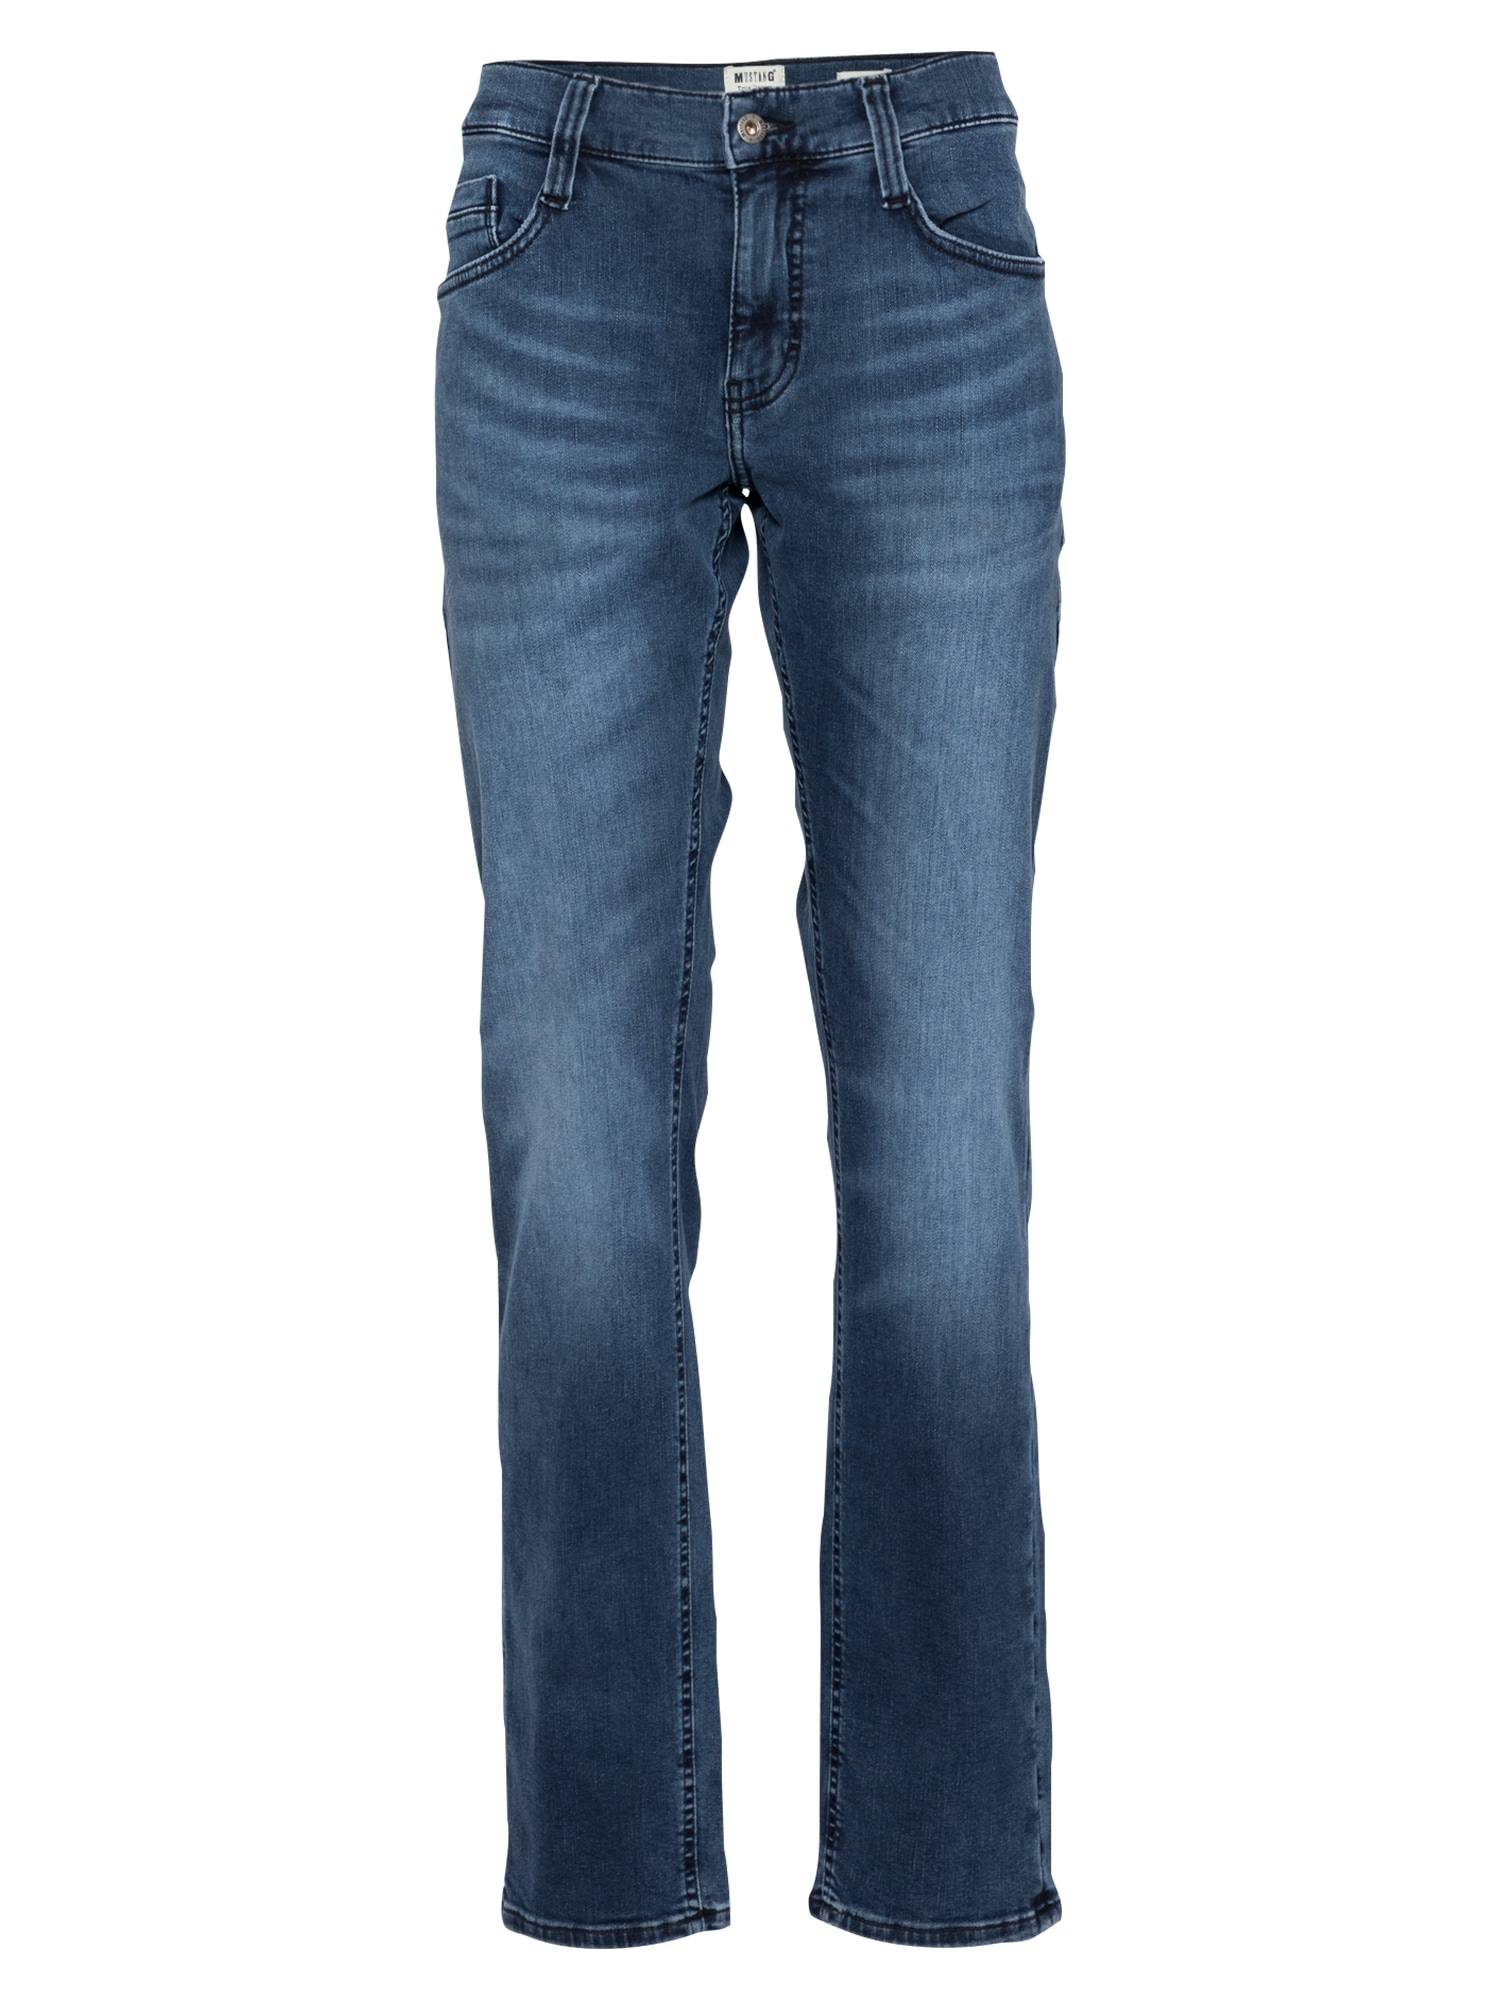 MUSTANG Jean 'Oregon'  - Bleu - Taille: 33/34 - male